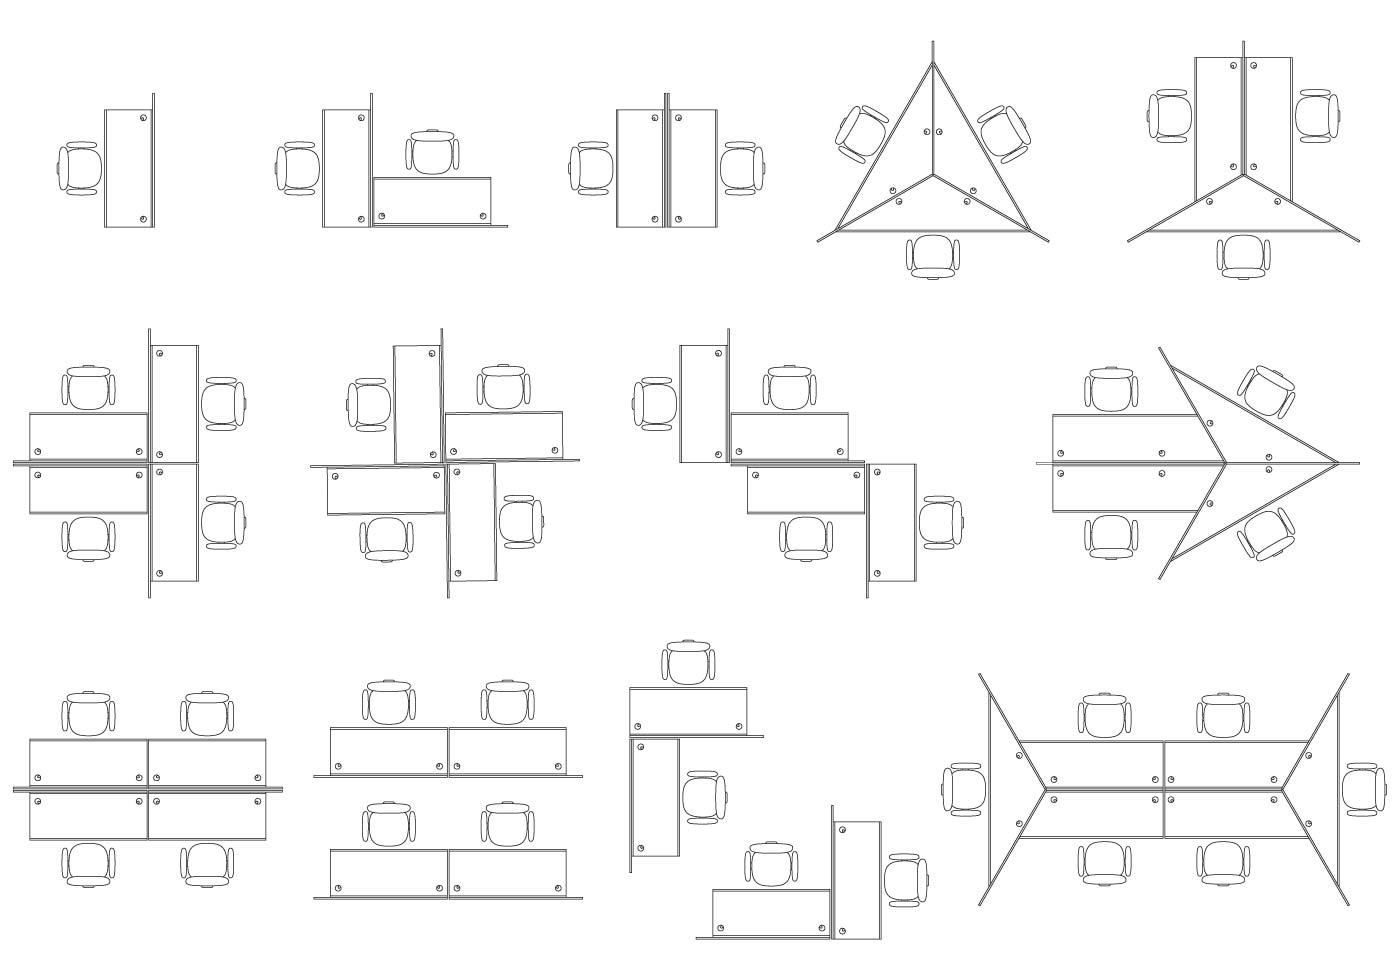 Office Cubicles Vectors Download Free Vector Art Stock